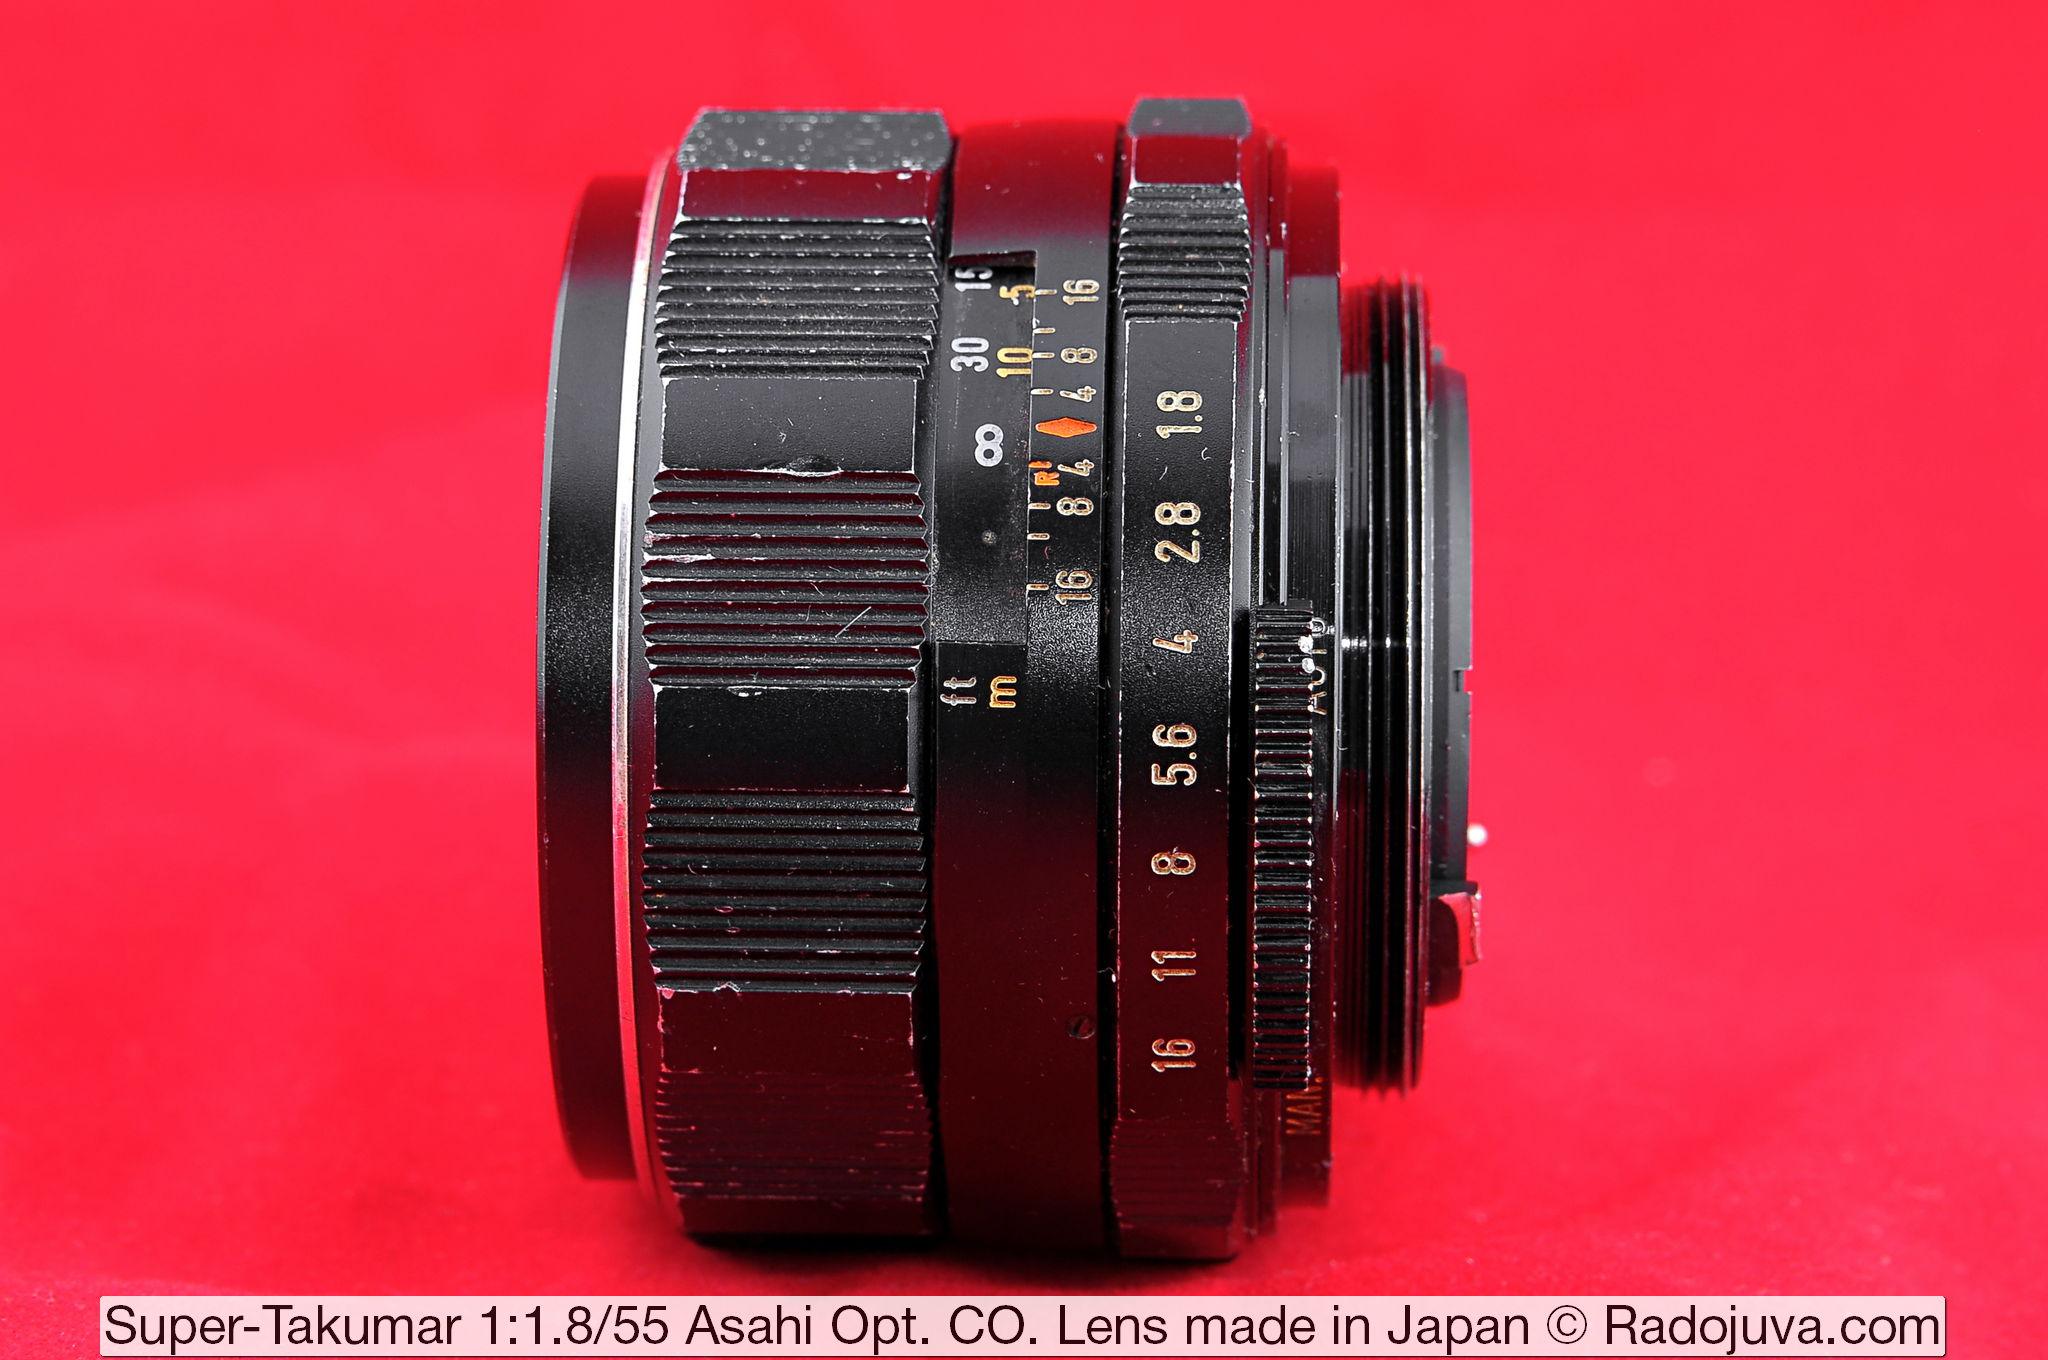 Объектив Super-Takumar 1:1.8/55 Asahi Opt. Co. Lens made in Japan